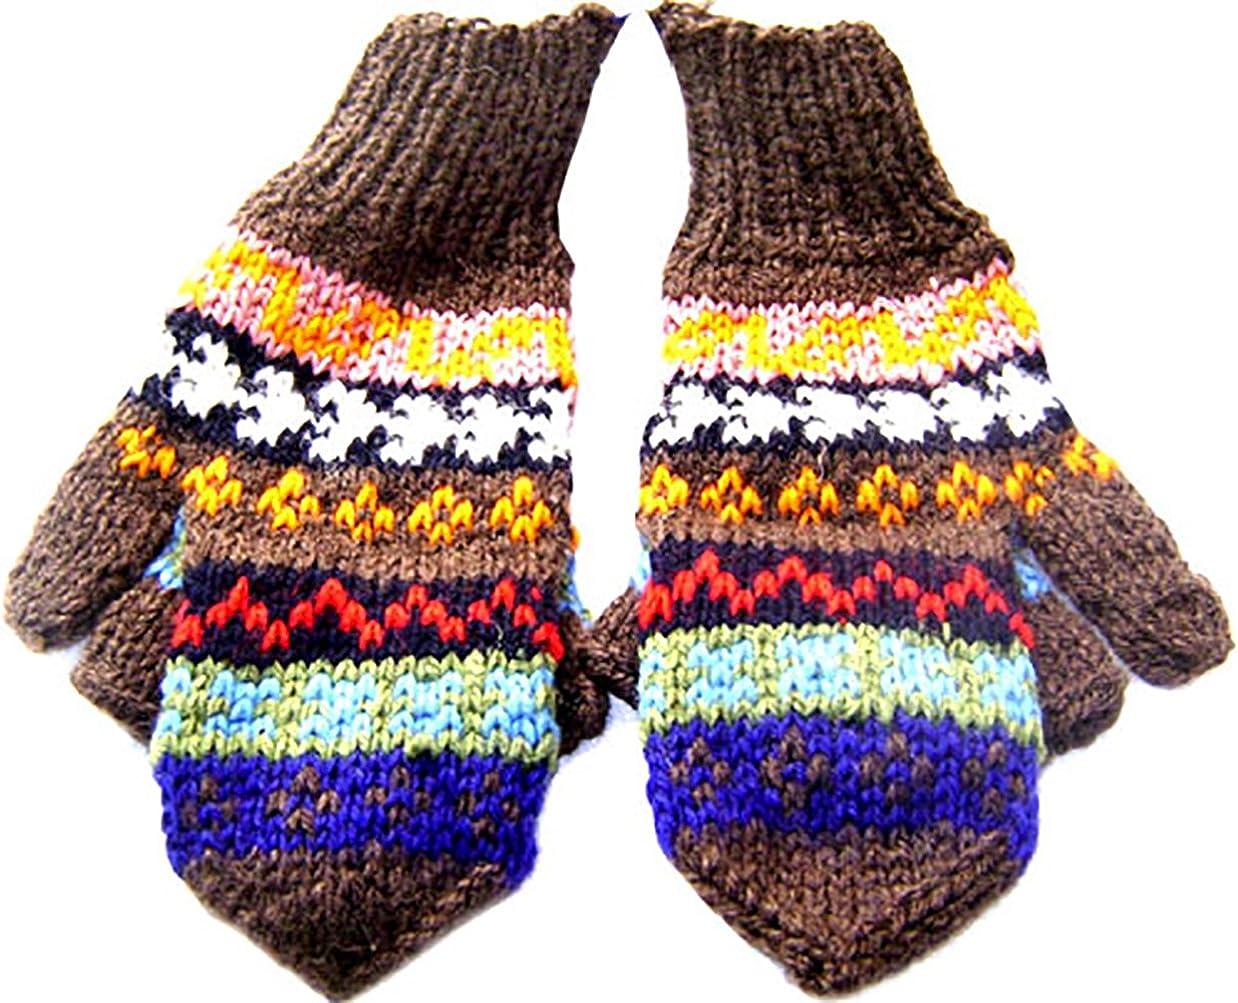 Gamboa - Warm Wool Mittens - Multicolour Design